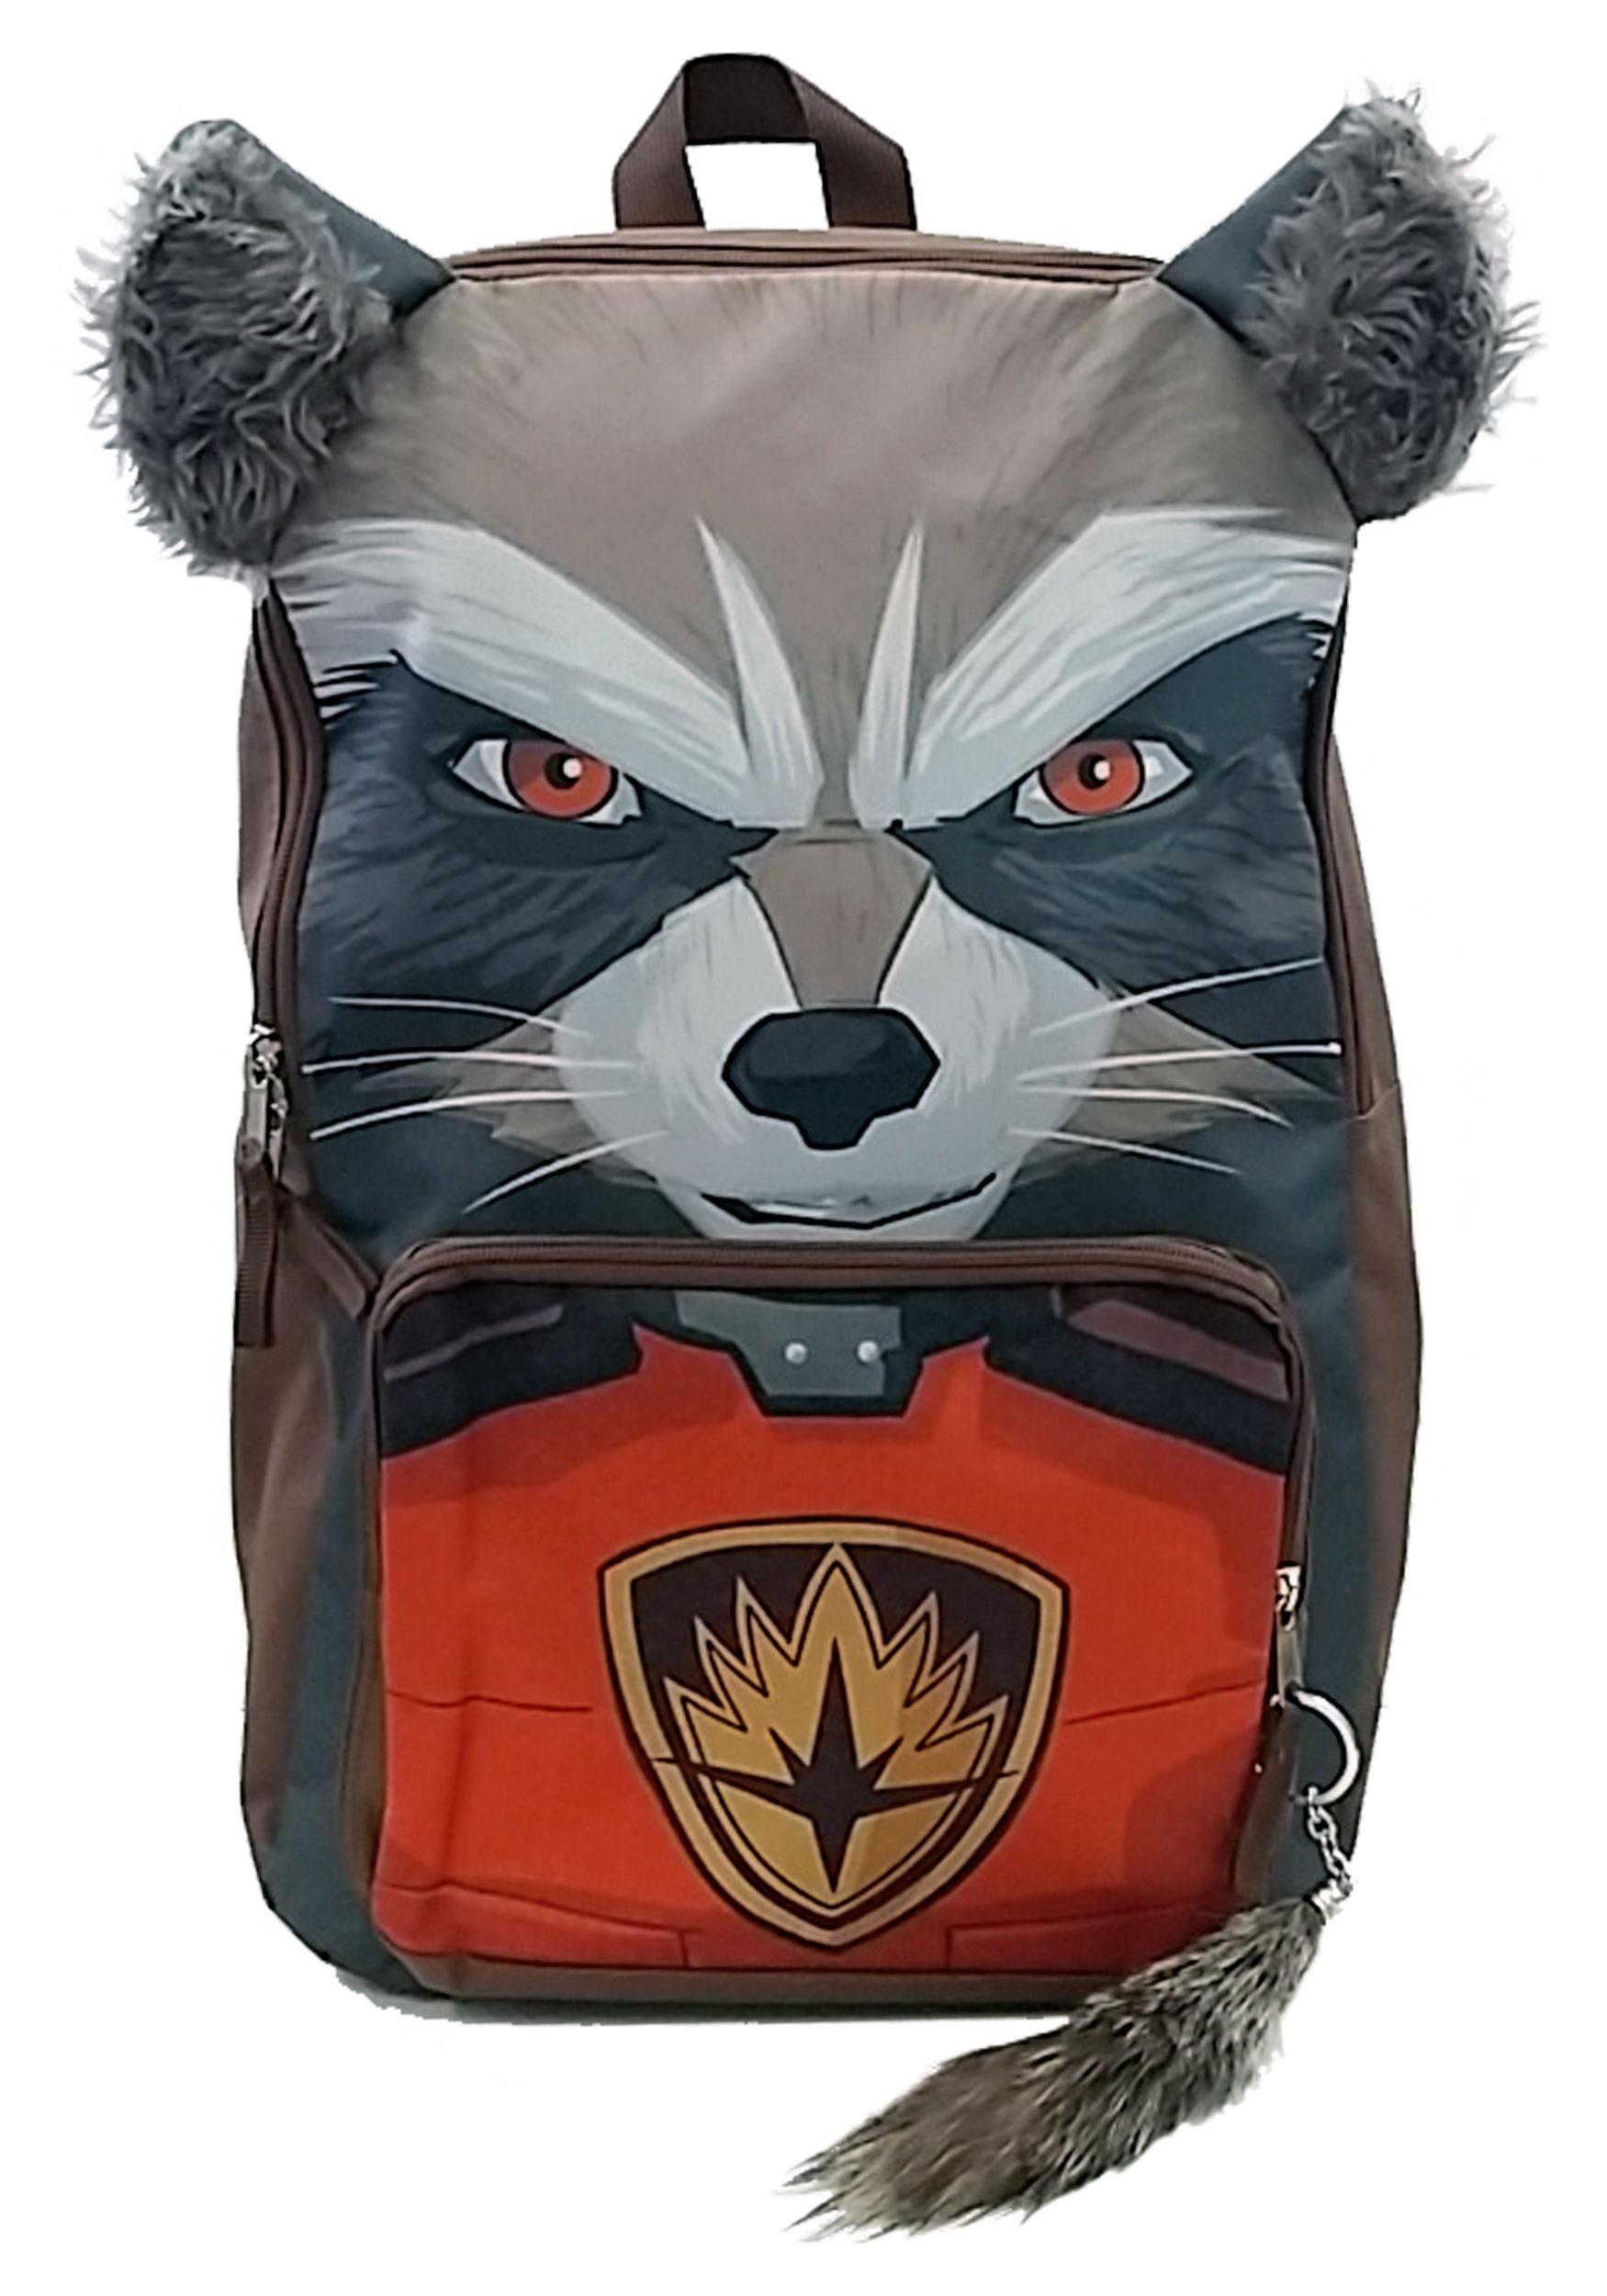 Marvels_Guardians_of_the_Galaxy_Rocket_Raccoon_Backpack